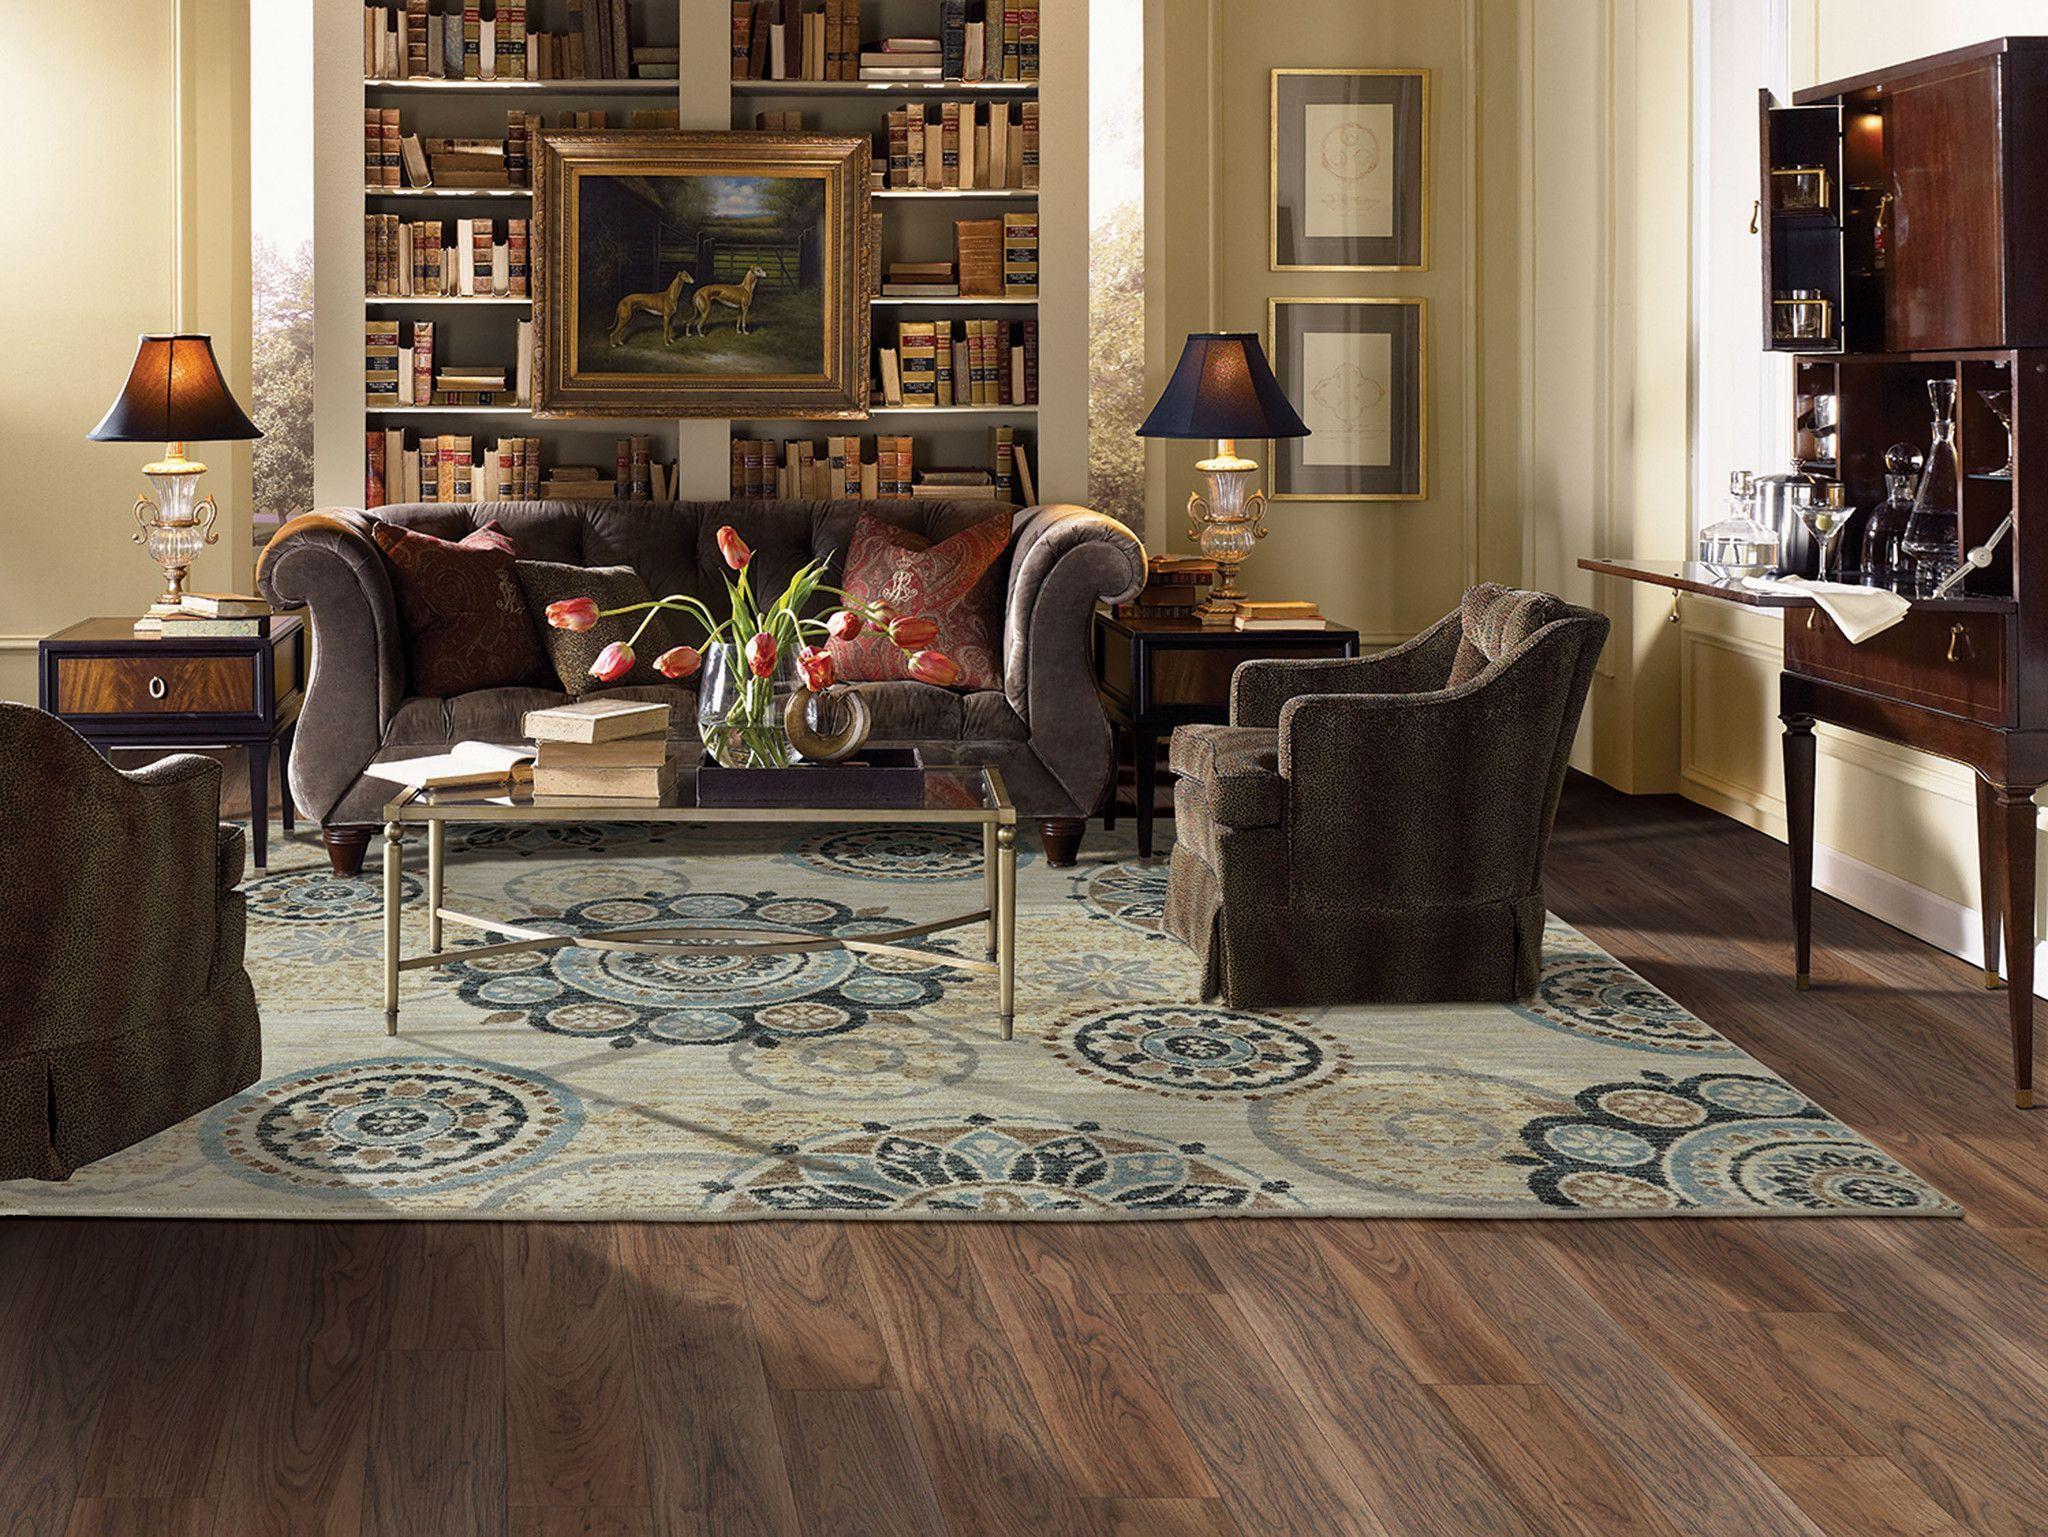 hardwood floor refinishing delaware of euphoria carron sandstone 90268 471 rug living room pinterest in euphoria carron sandstone 90268 471 rug